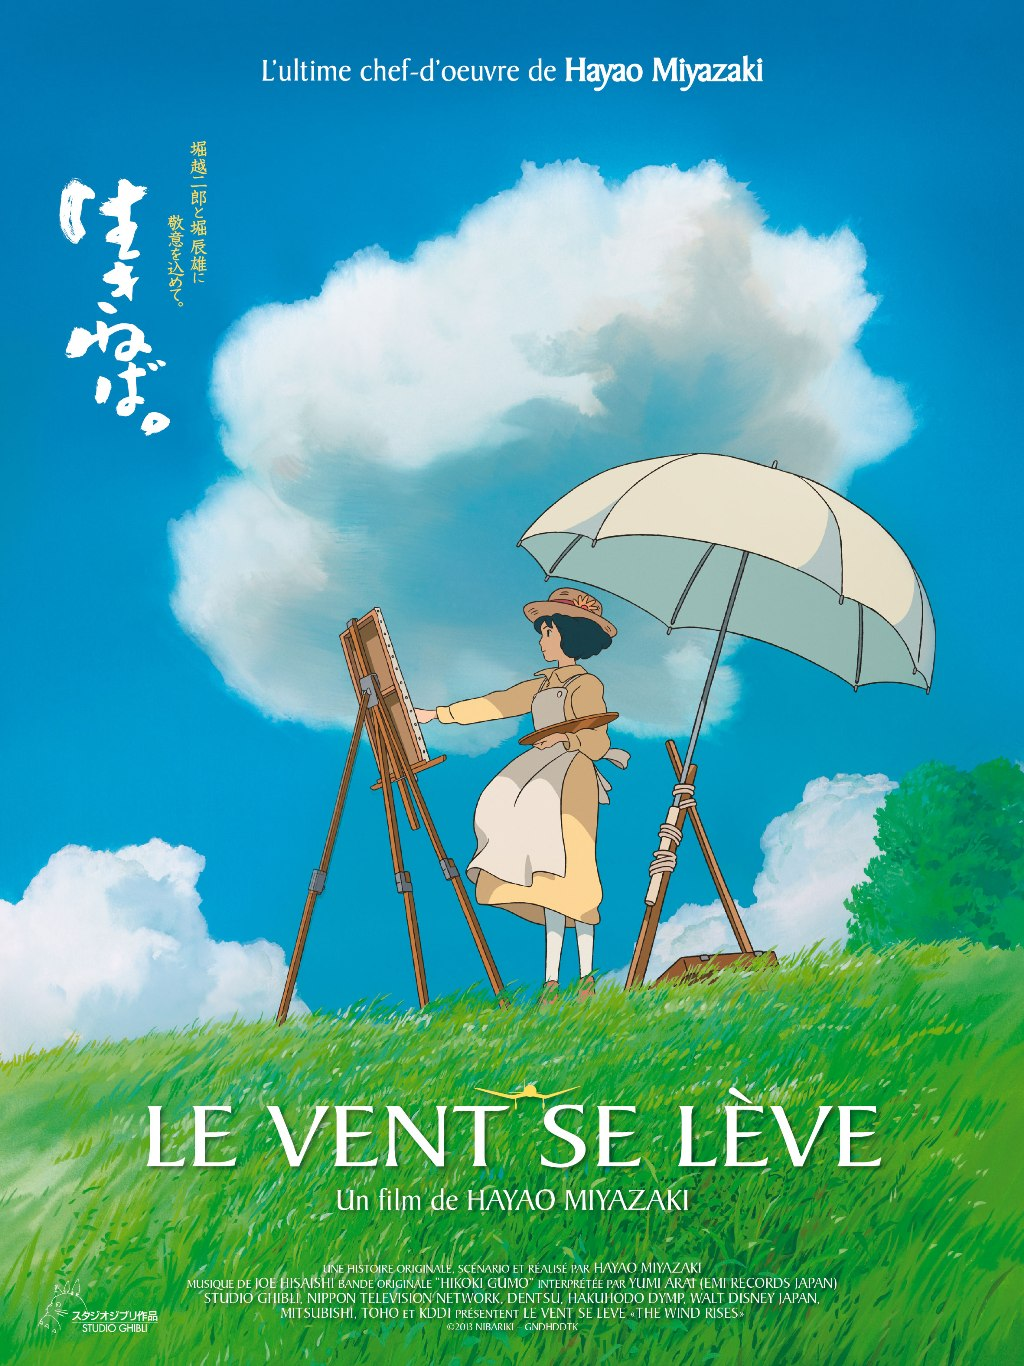 le-vent-se-leve-affiche-du-dernier-hayao-miyazaki-affiche.jpg